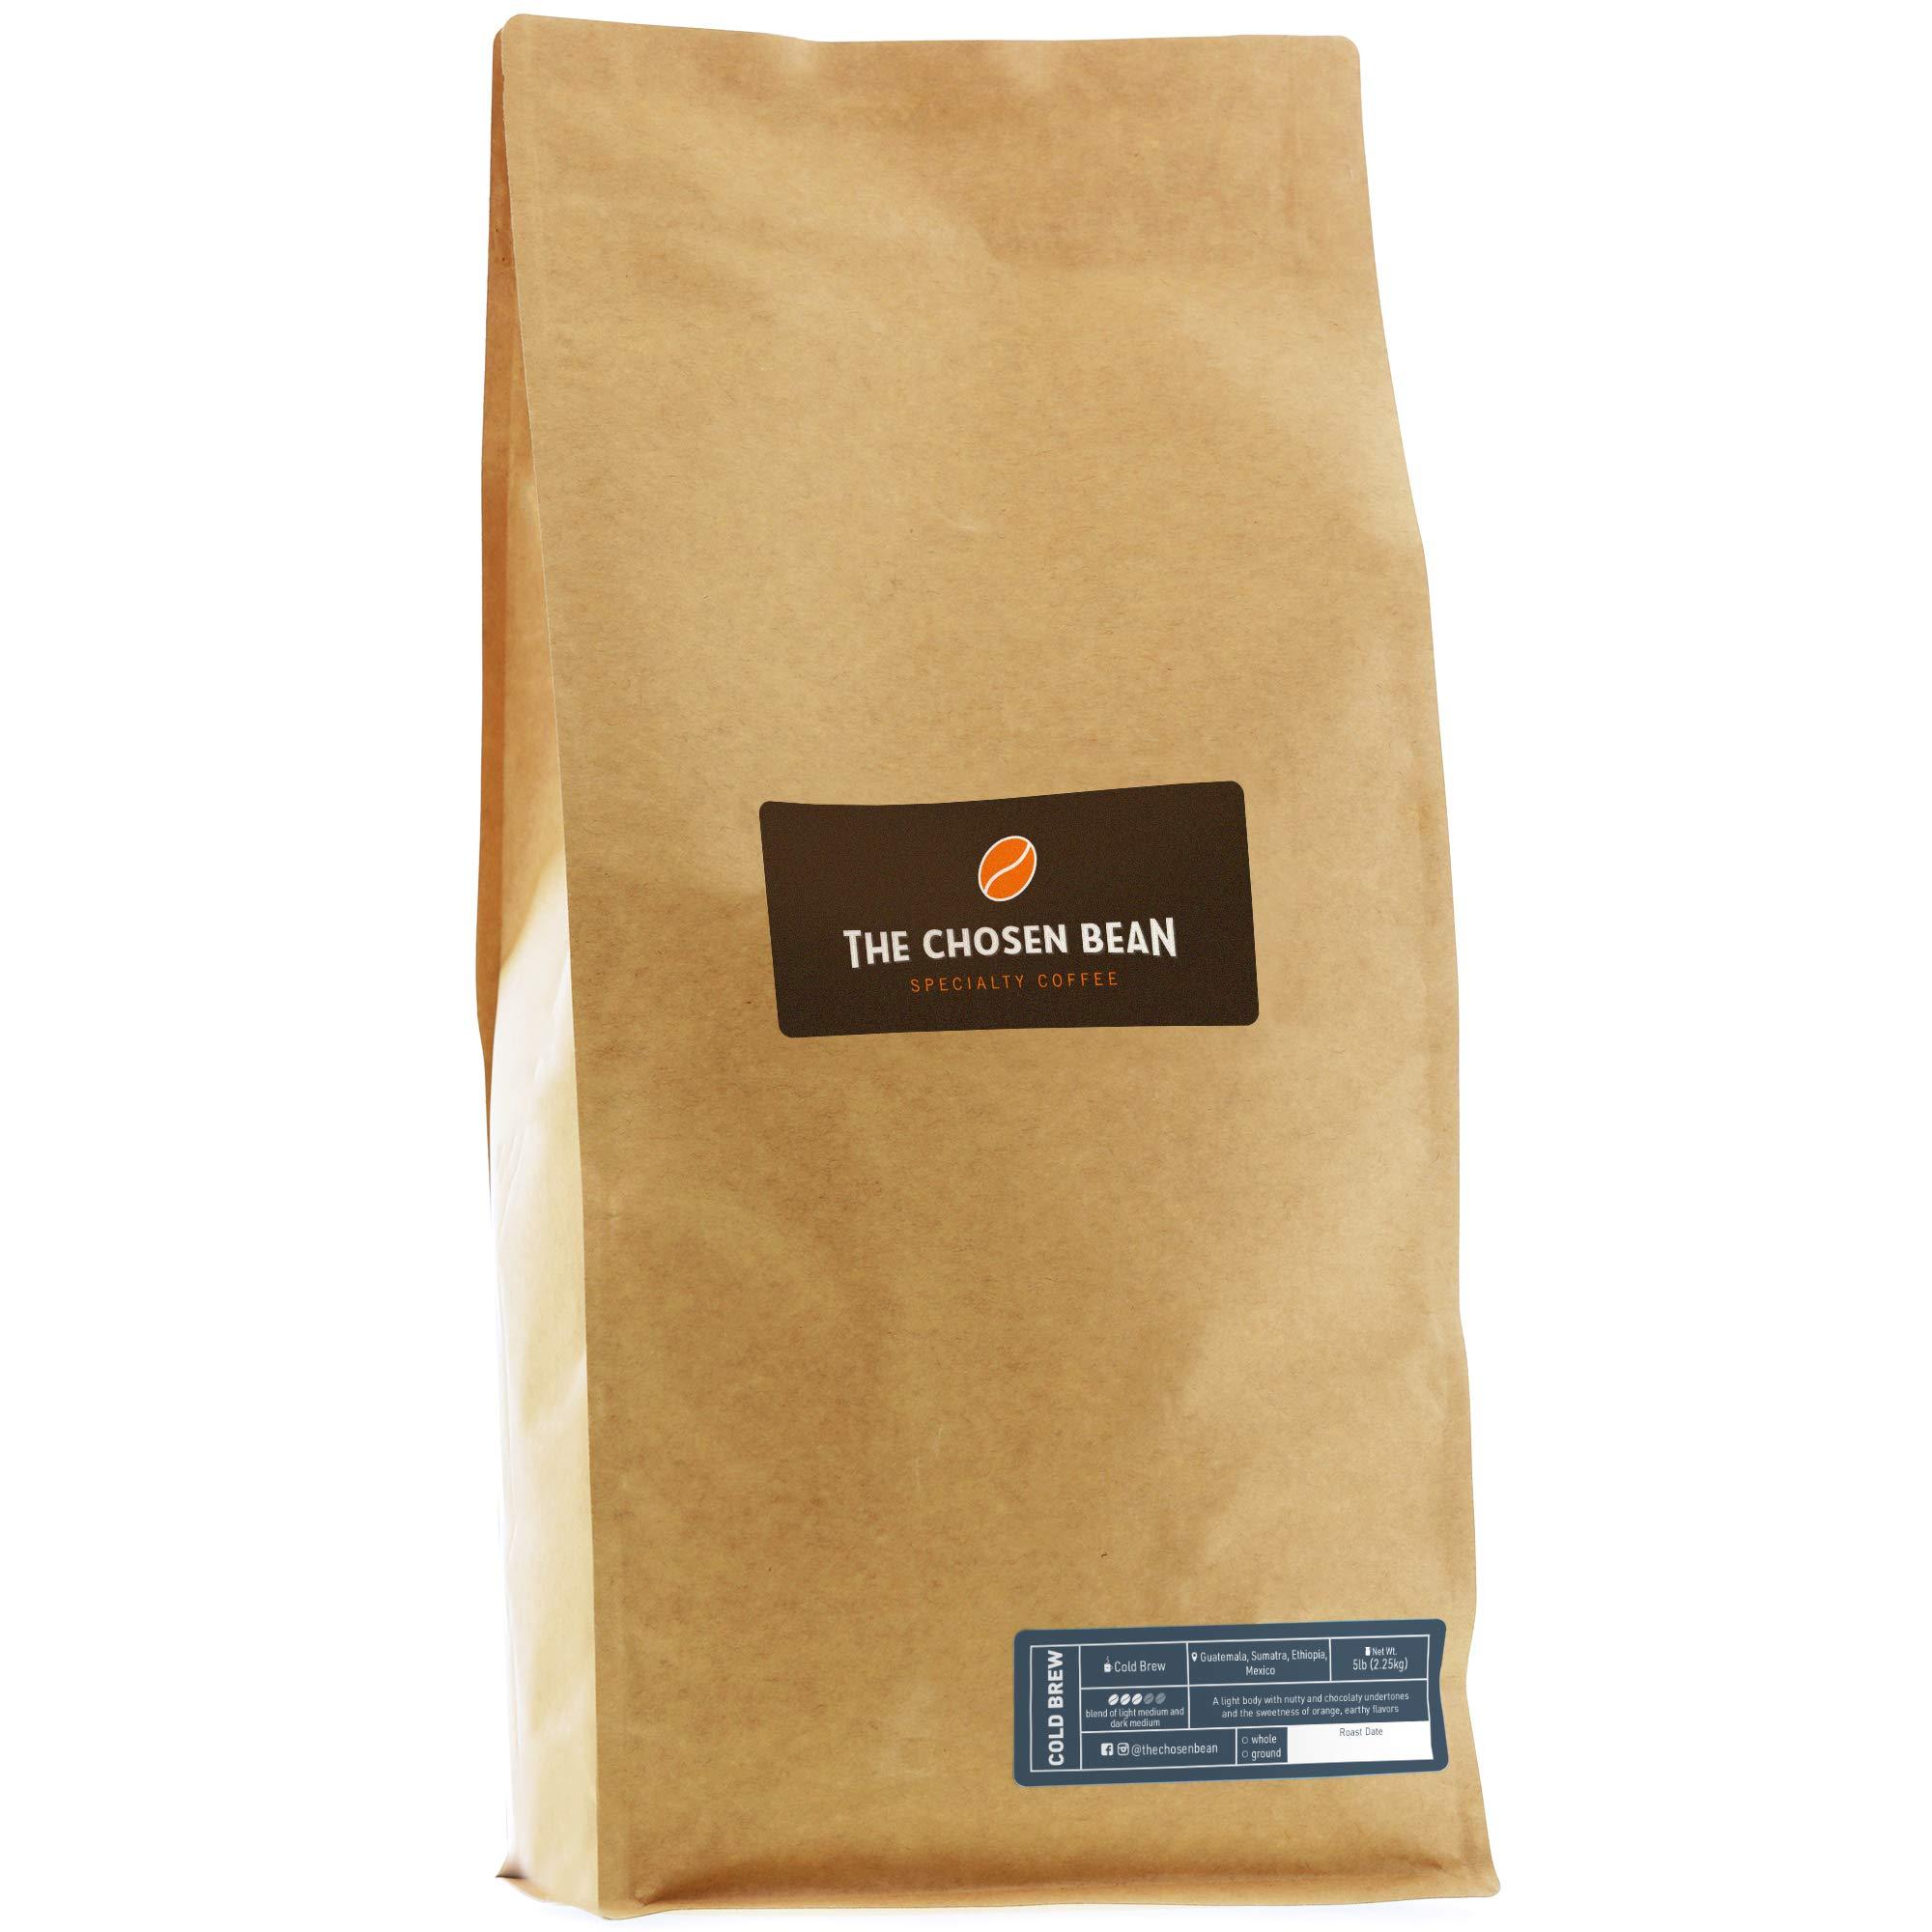 The Chosen Bean Premium Artisan Cold Brew Ground Coffee Beans, Small Batch Roasted, Organic and Fair Trade Roasters, 5 lbs by The Chosen Bean